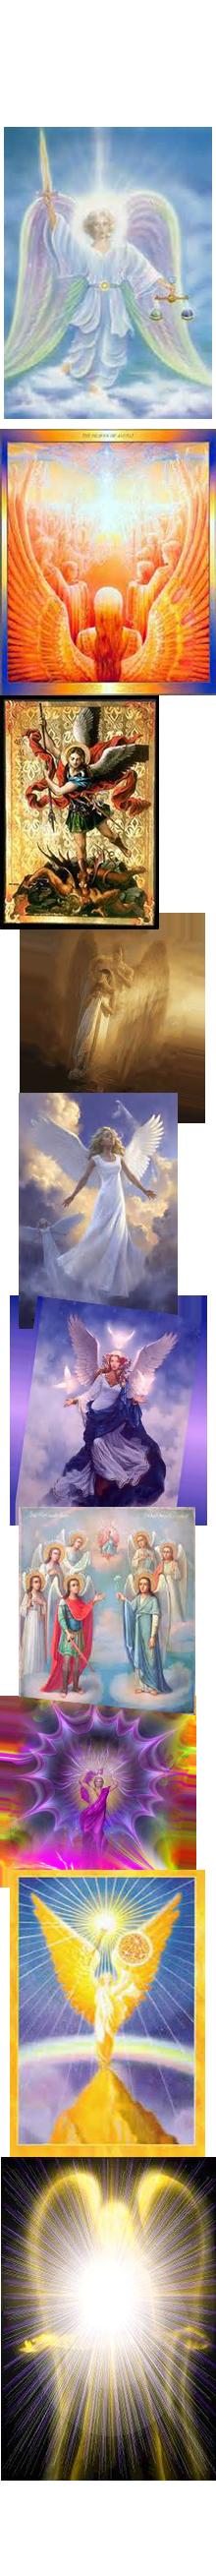 Angels-border